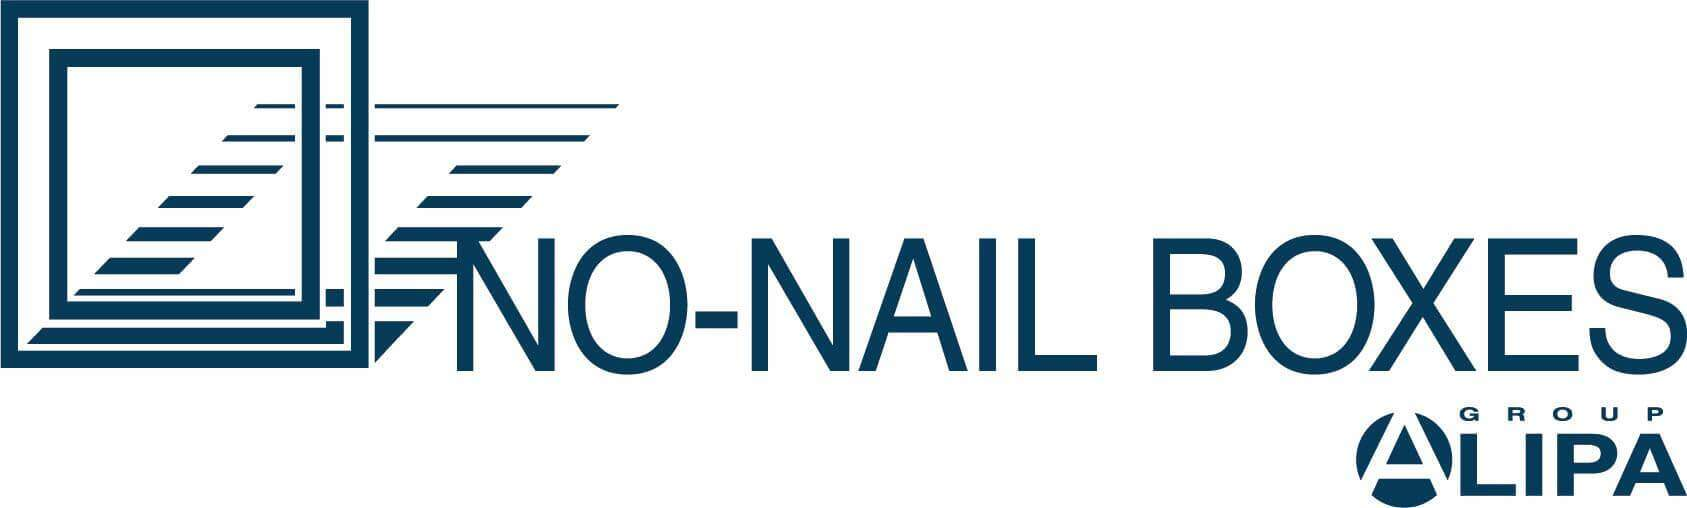 No-Nail Boxes logo print version